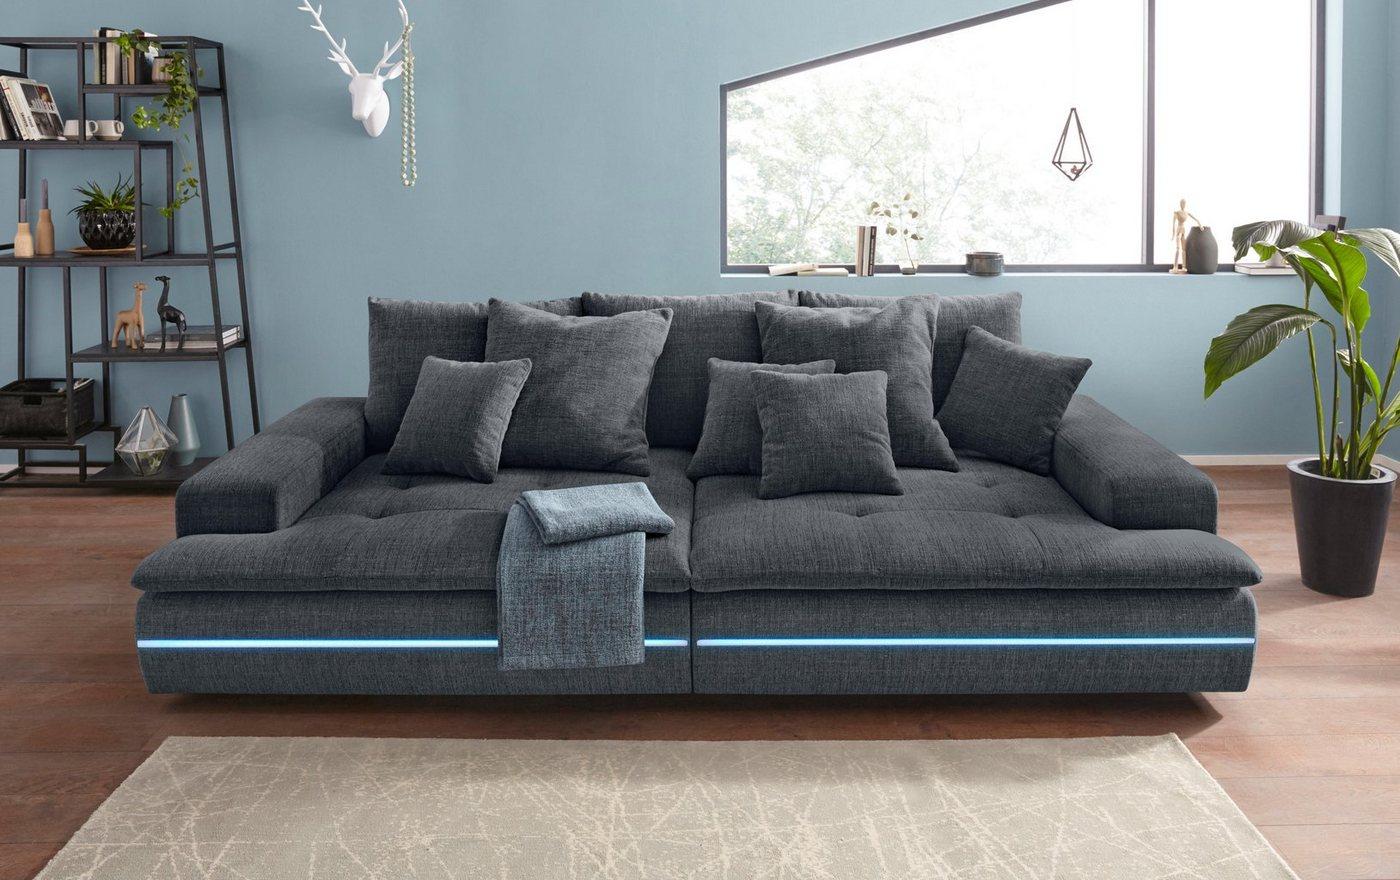 Nova Via Big-Sofa | Wohnzimmer > Sofas & Couches > Bigsofas | Grau | Nova Via